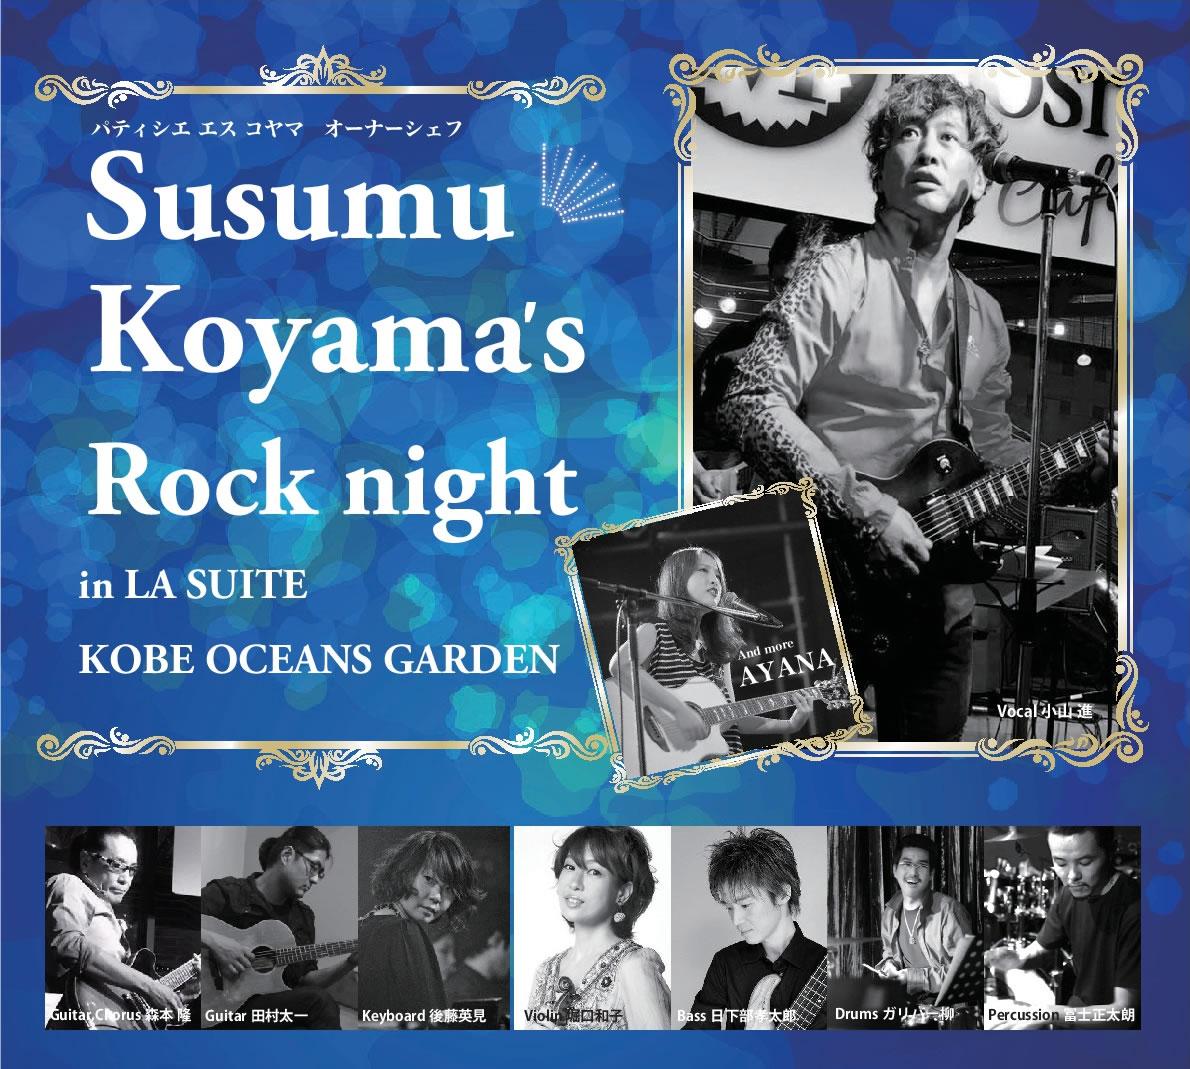 Susumu Koyama's Rock night